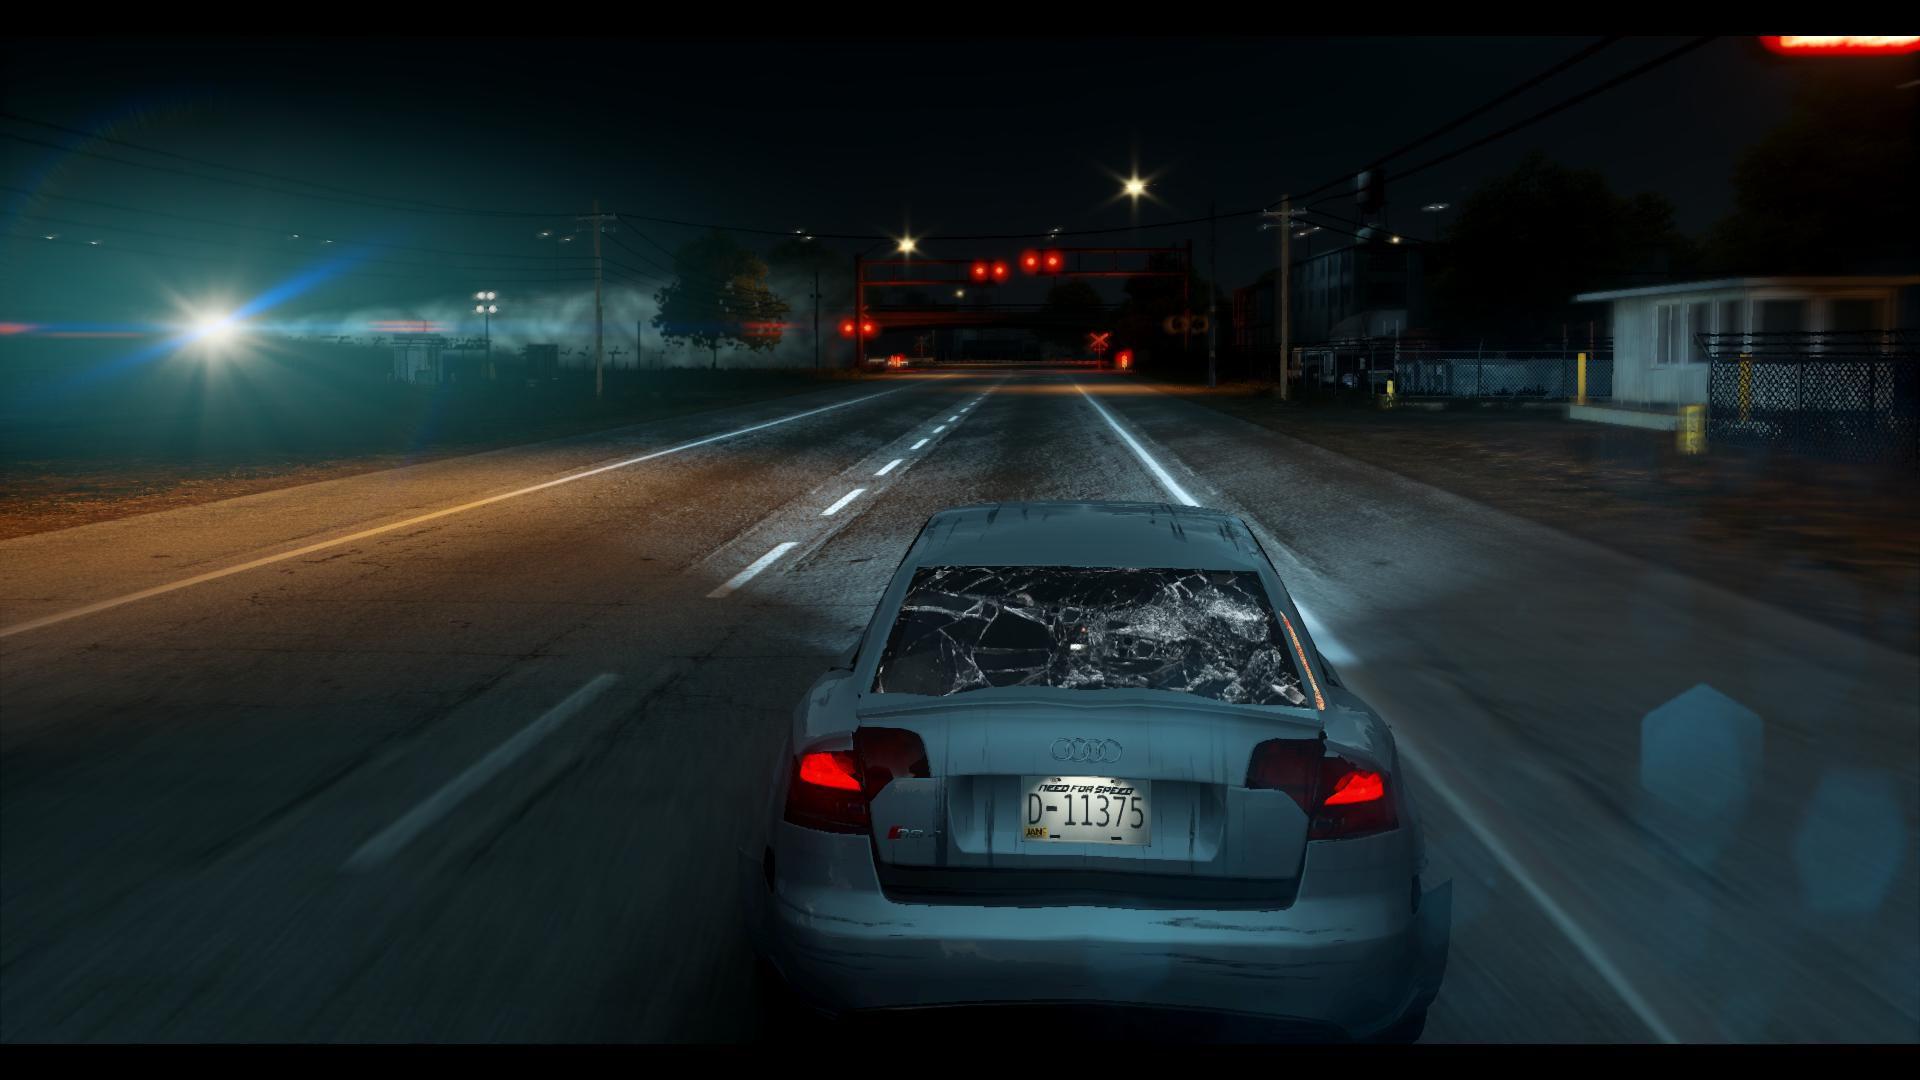 Need For Speed The Run 2011-11-15 17-16-56-32.jpg